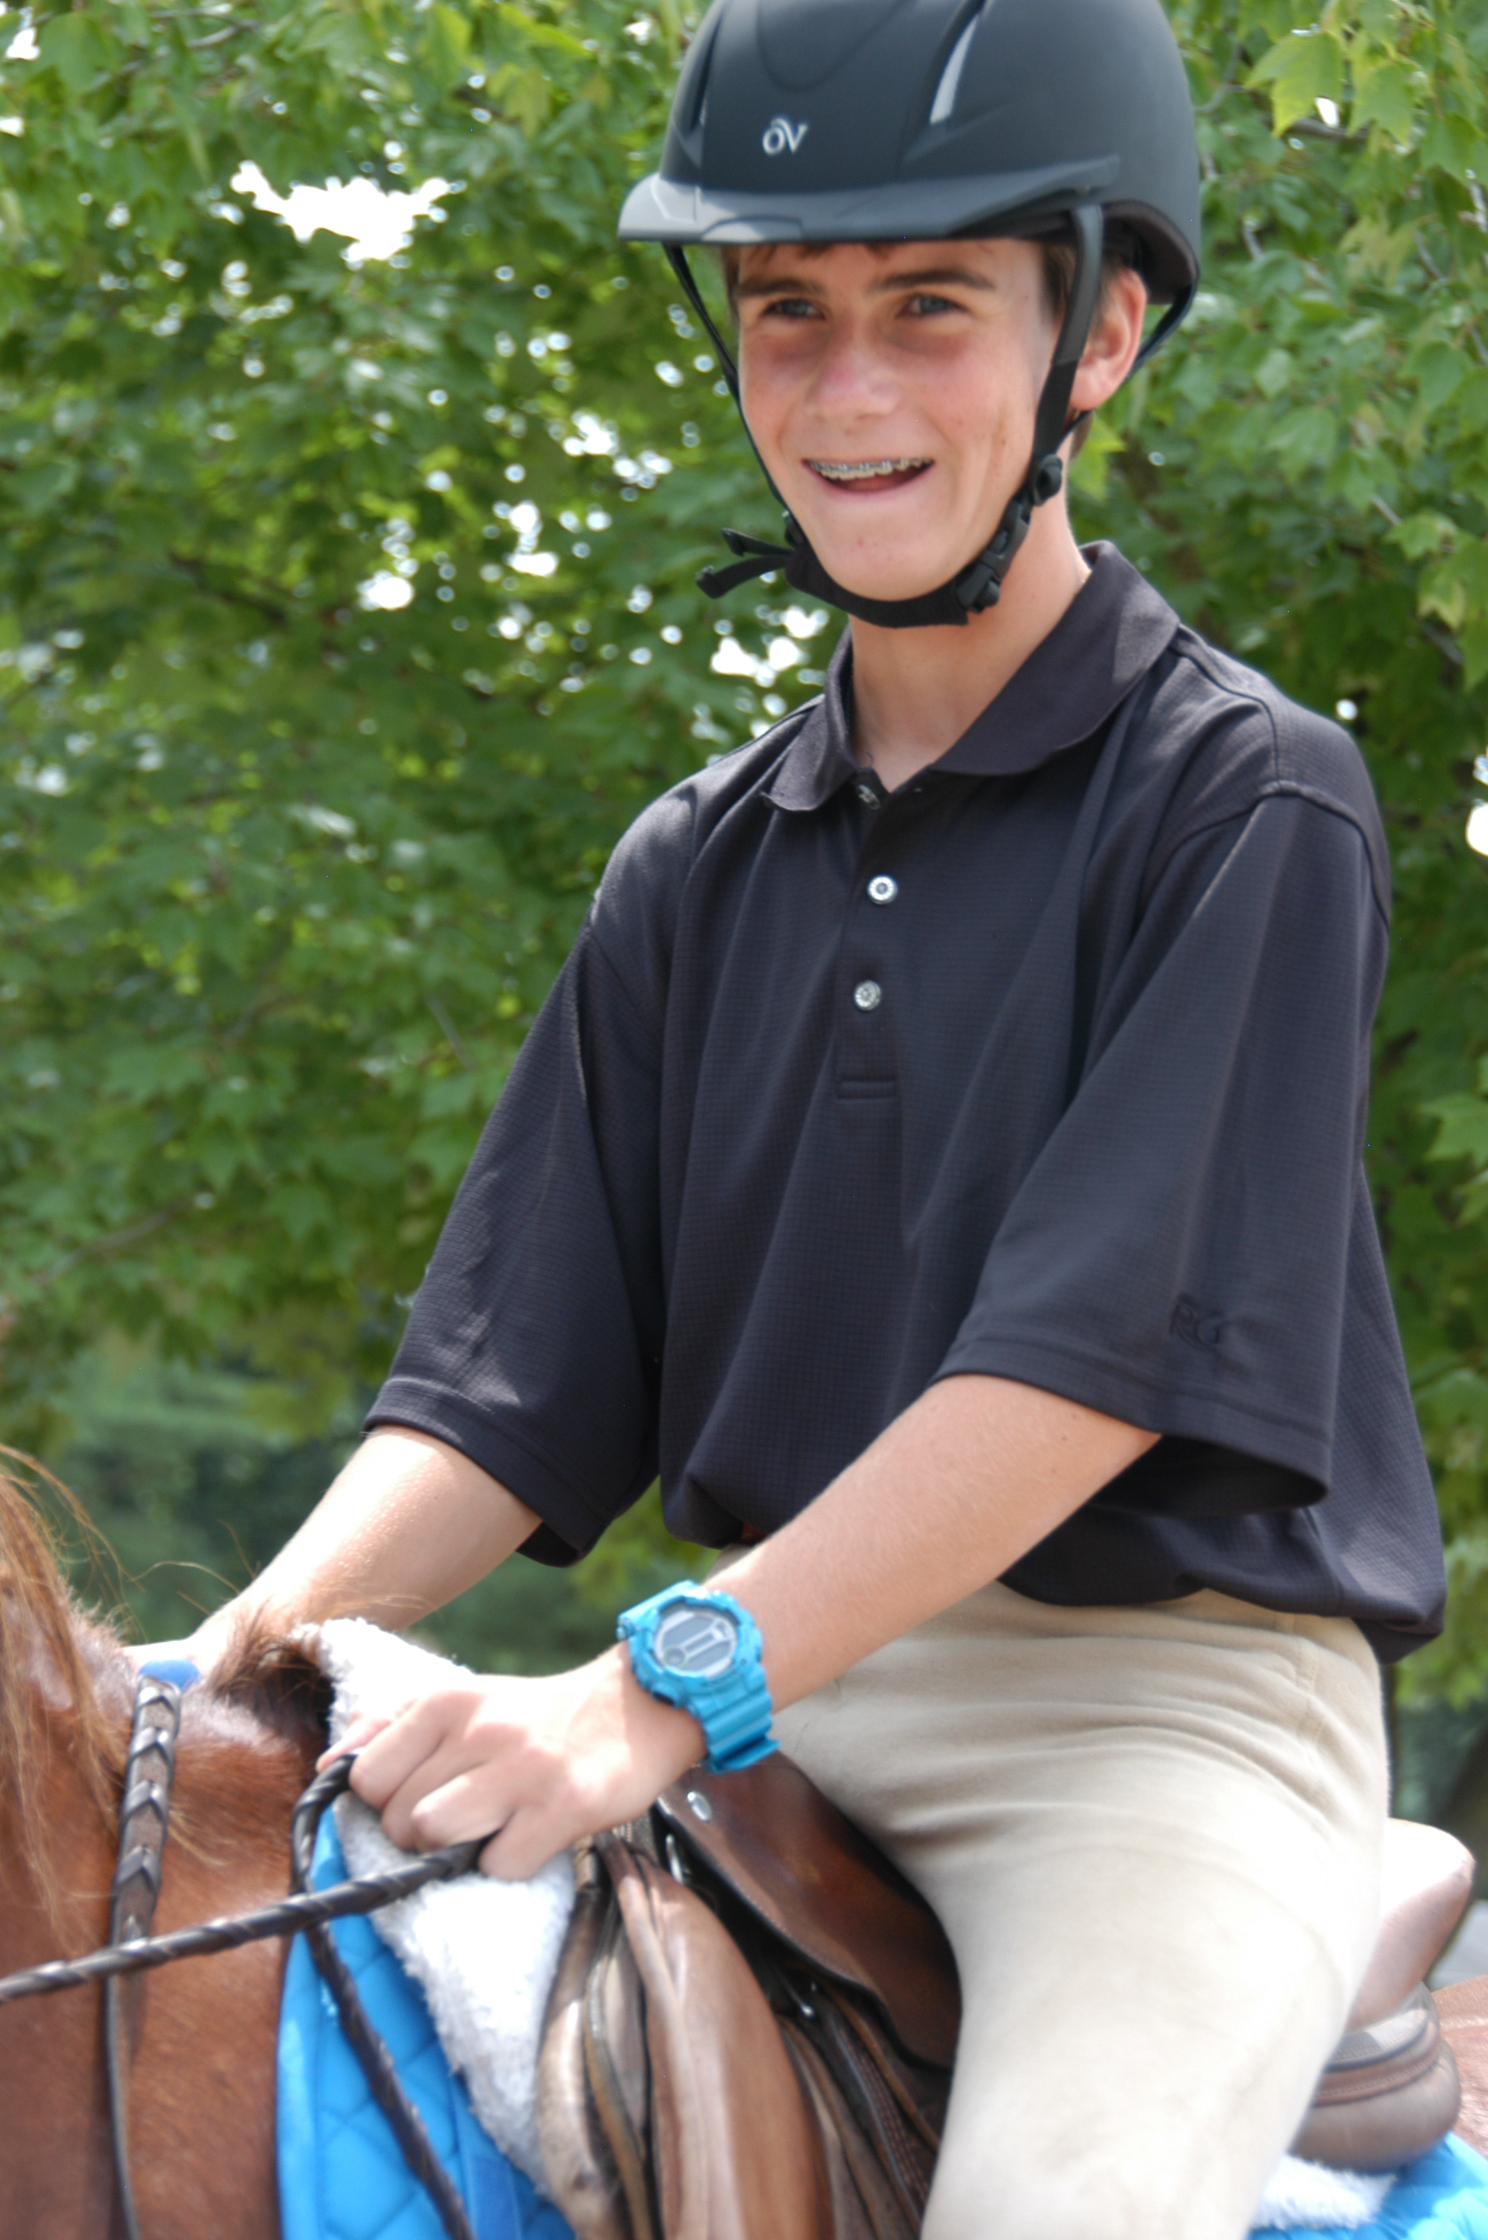 Thomas School of Horsemanship Summer Day Camp & Riding School image 1